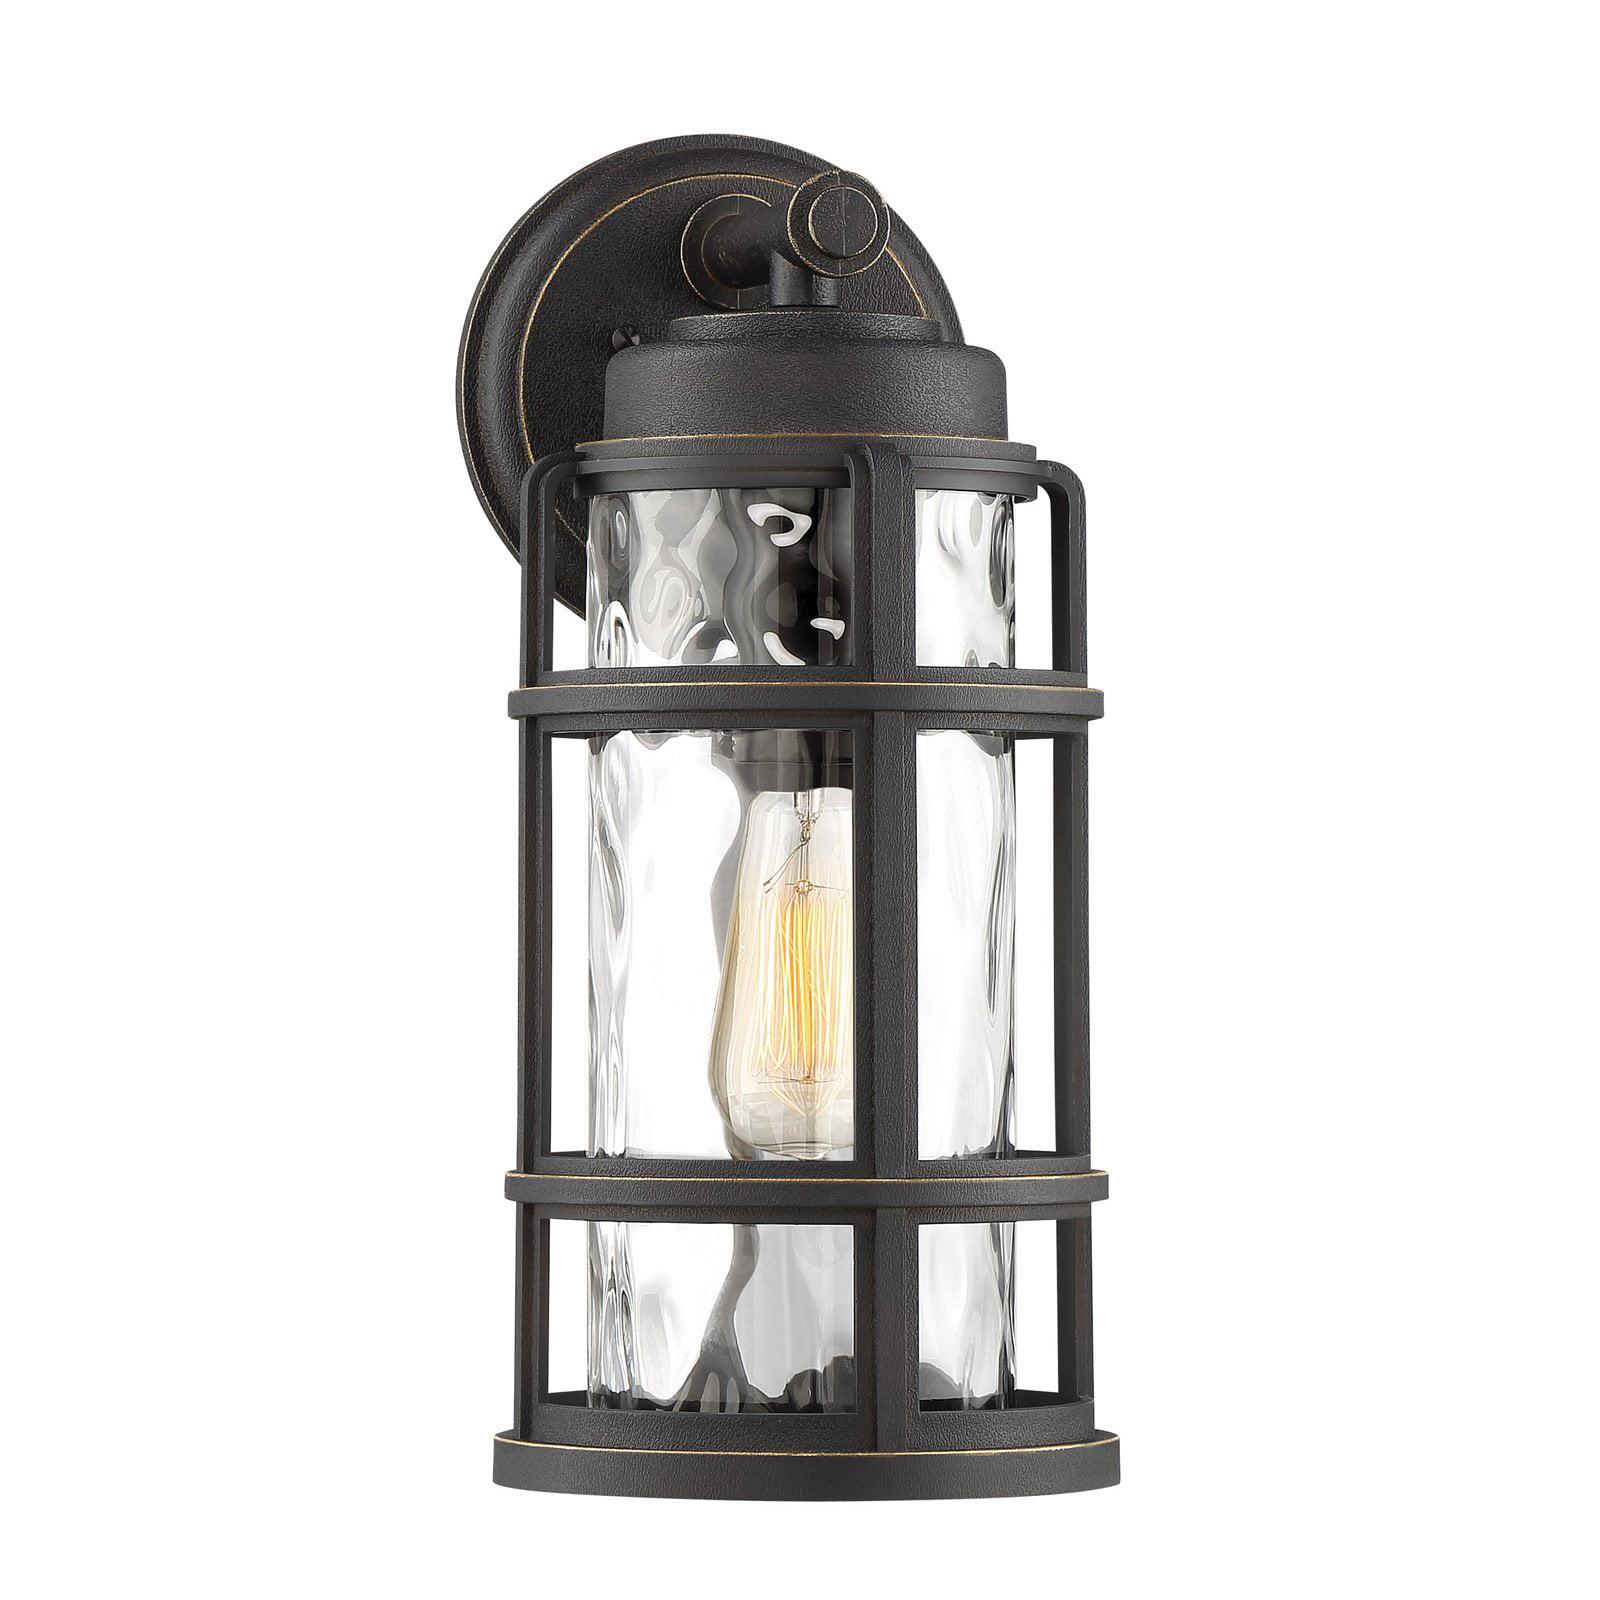 Quoizel DeSoto DST840 Outdoor Wall Lantern